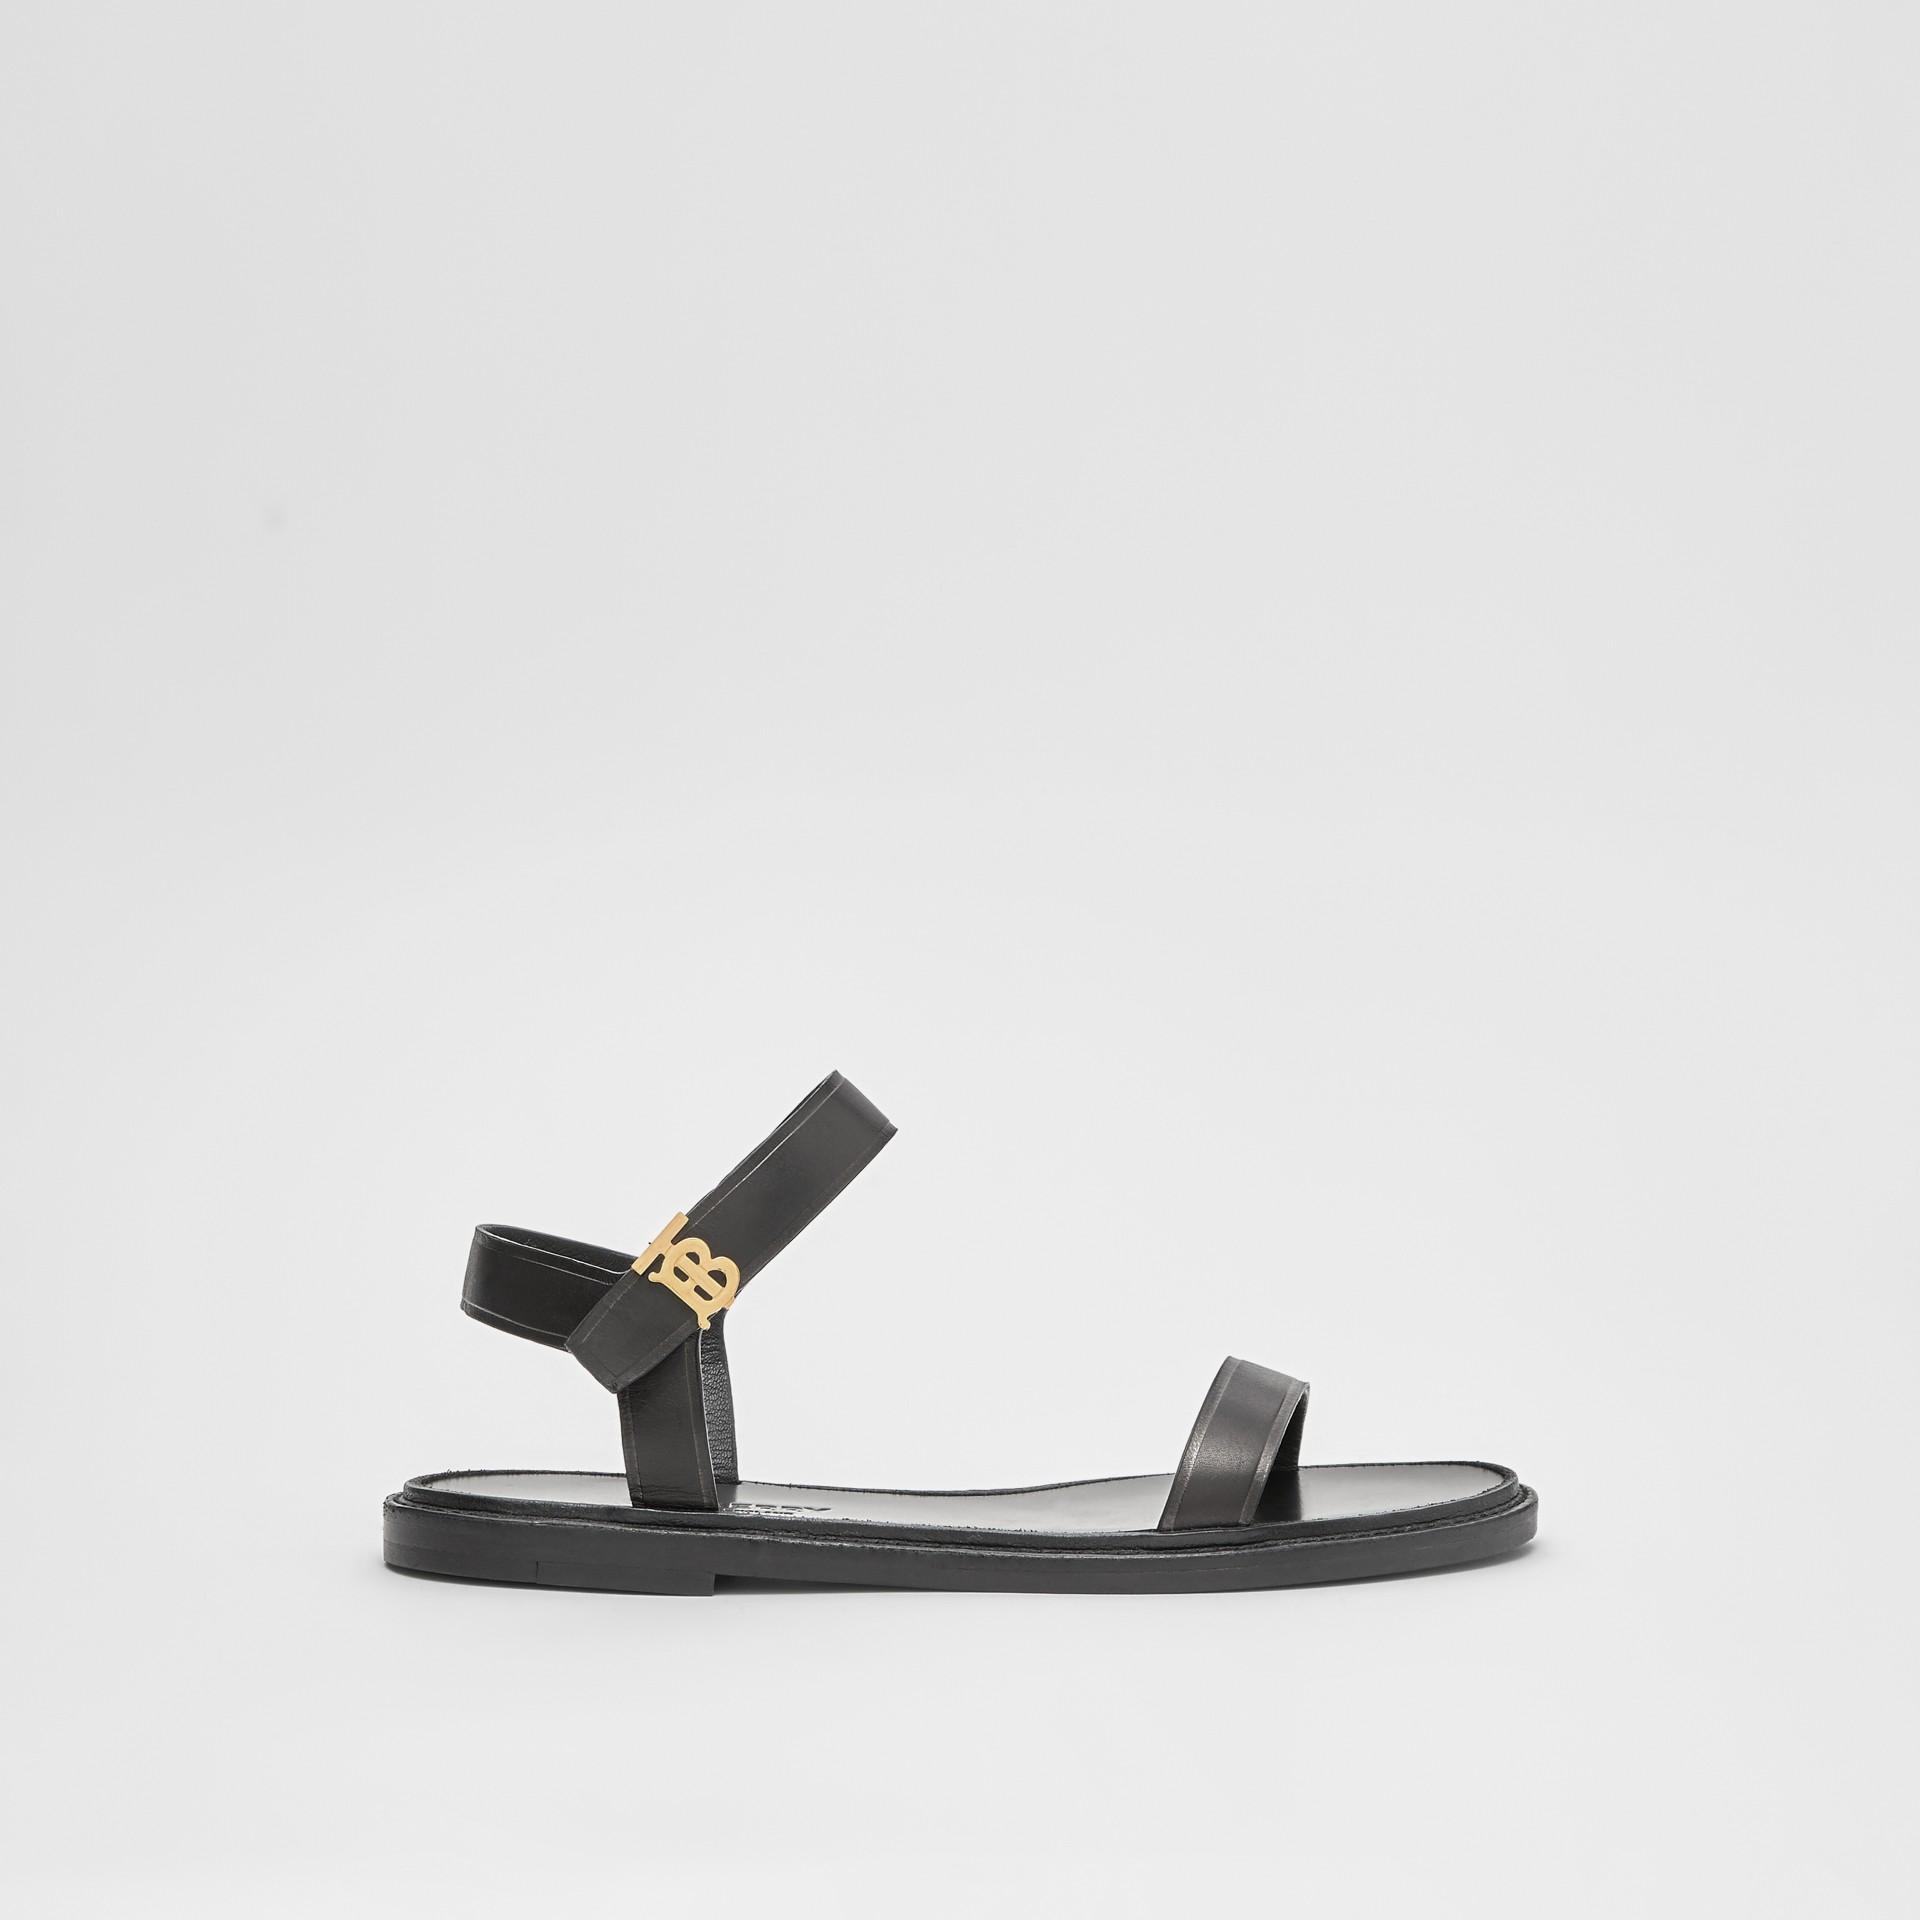 Monogram Motif Leather Sandals in Black - Women | Burberry United Kingdom - gallery image 4